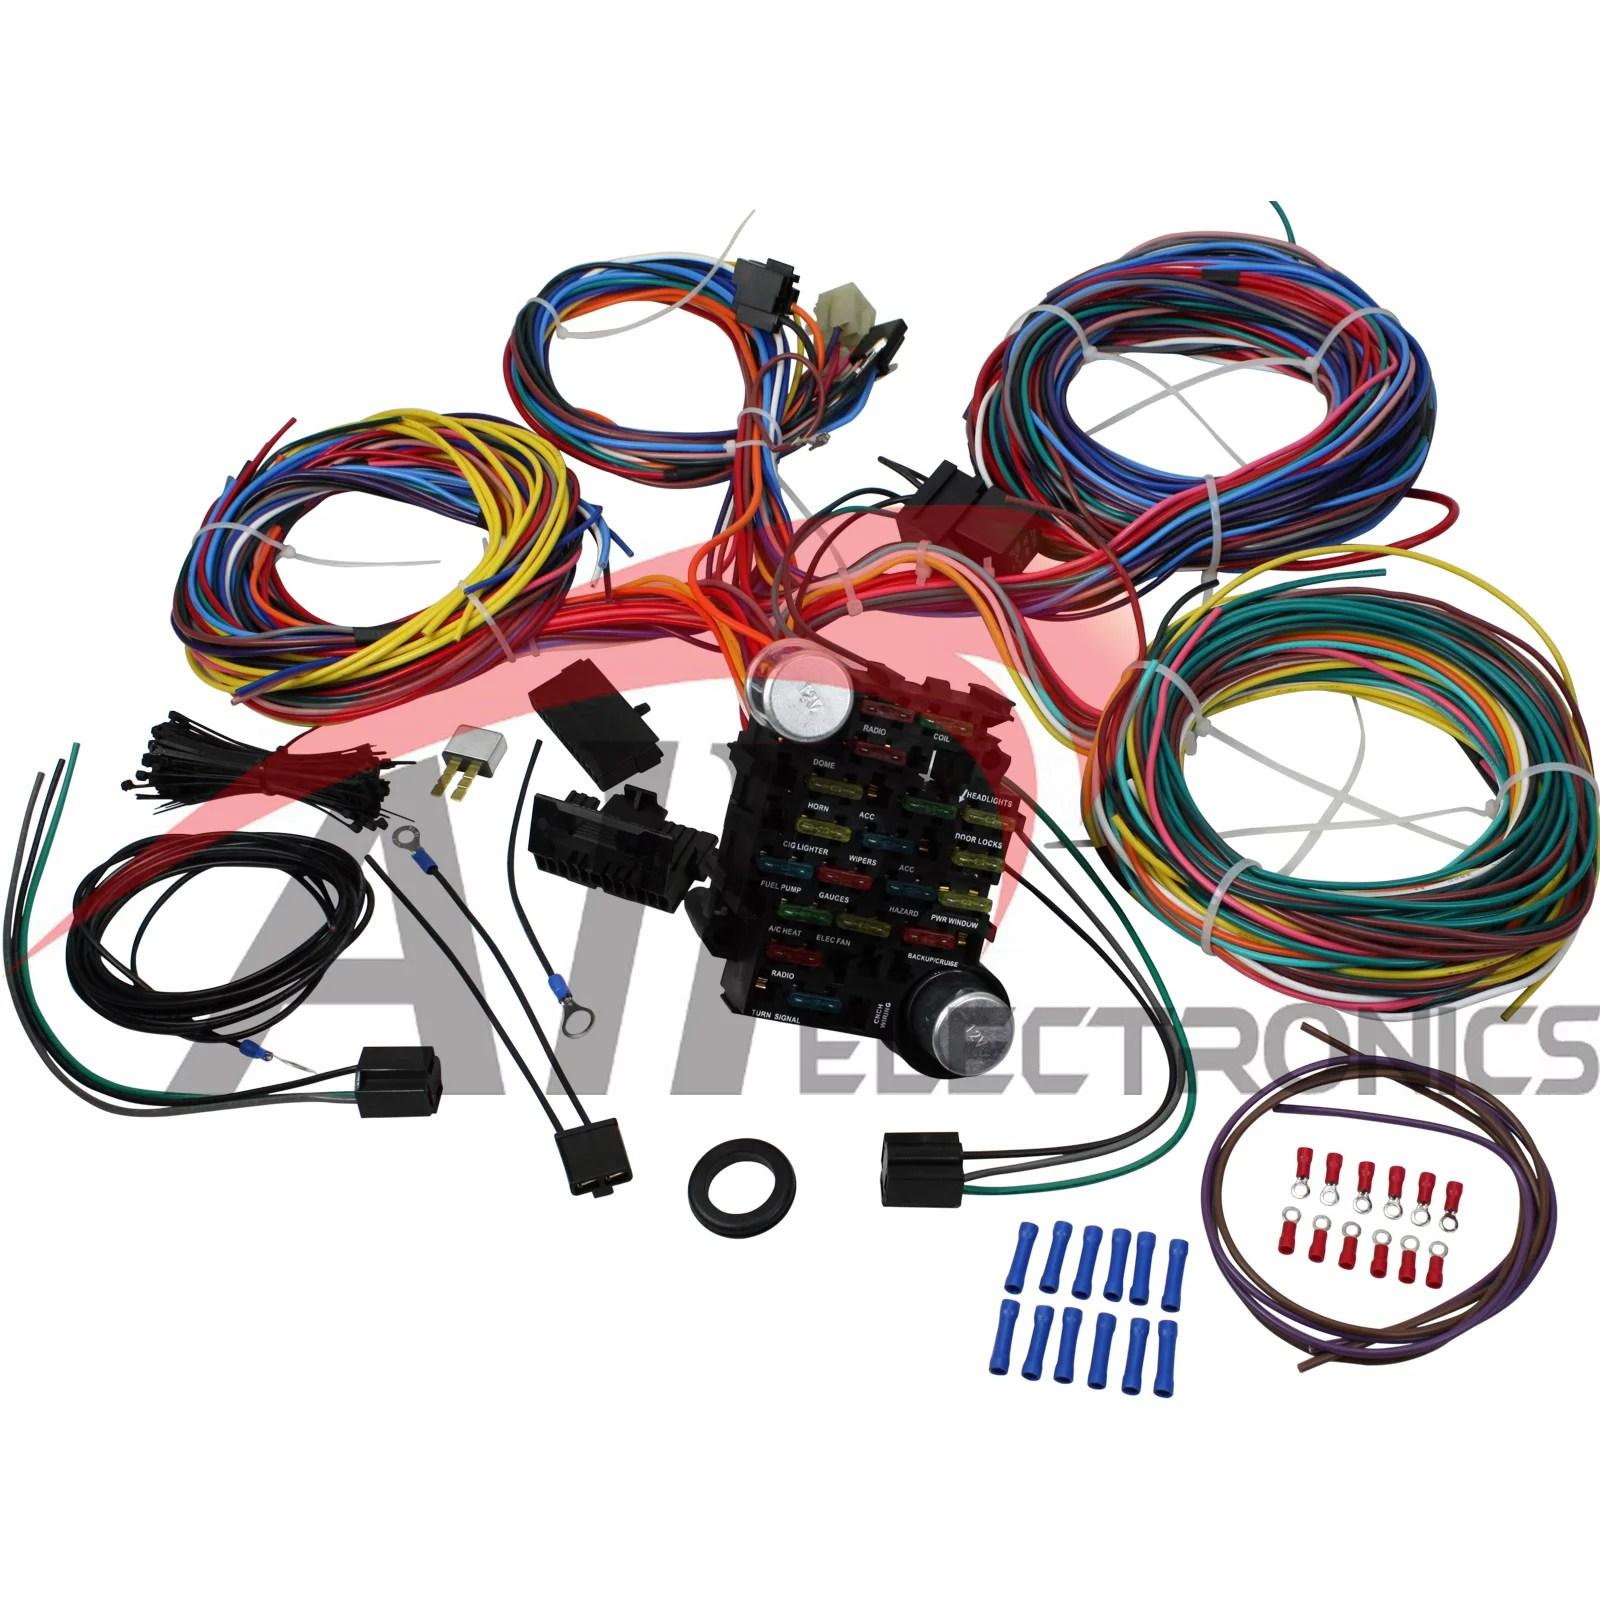 small resolution of hd wallpapers pioneer radio deh 24ub wiring diagram